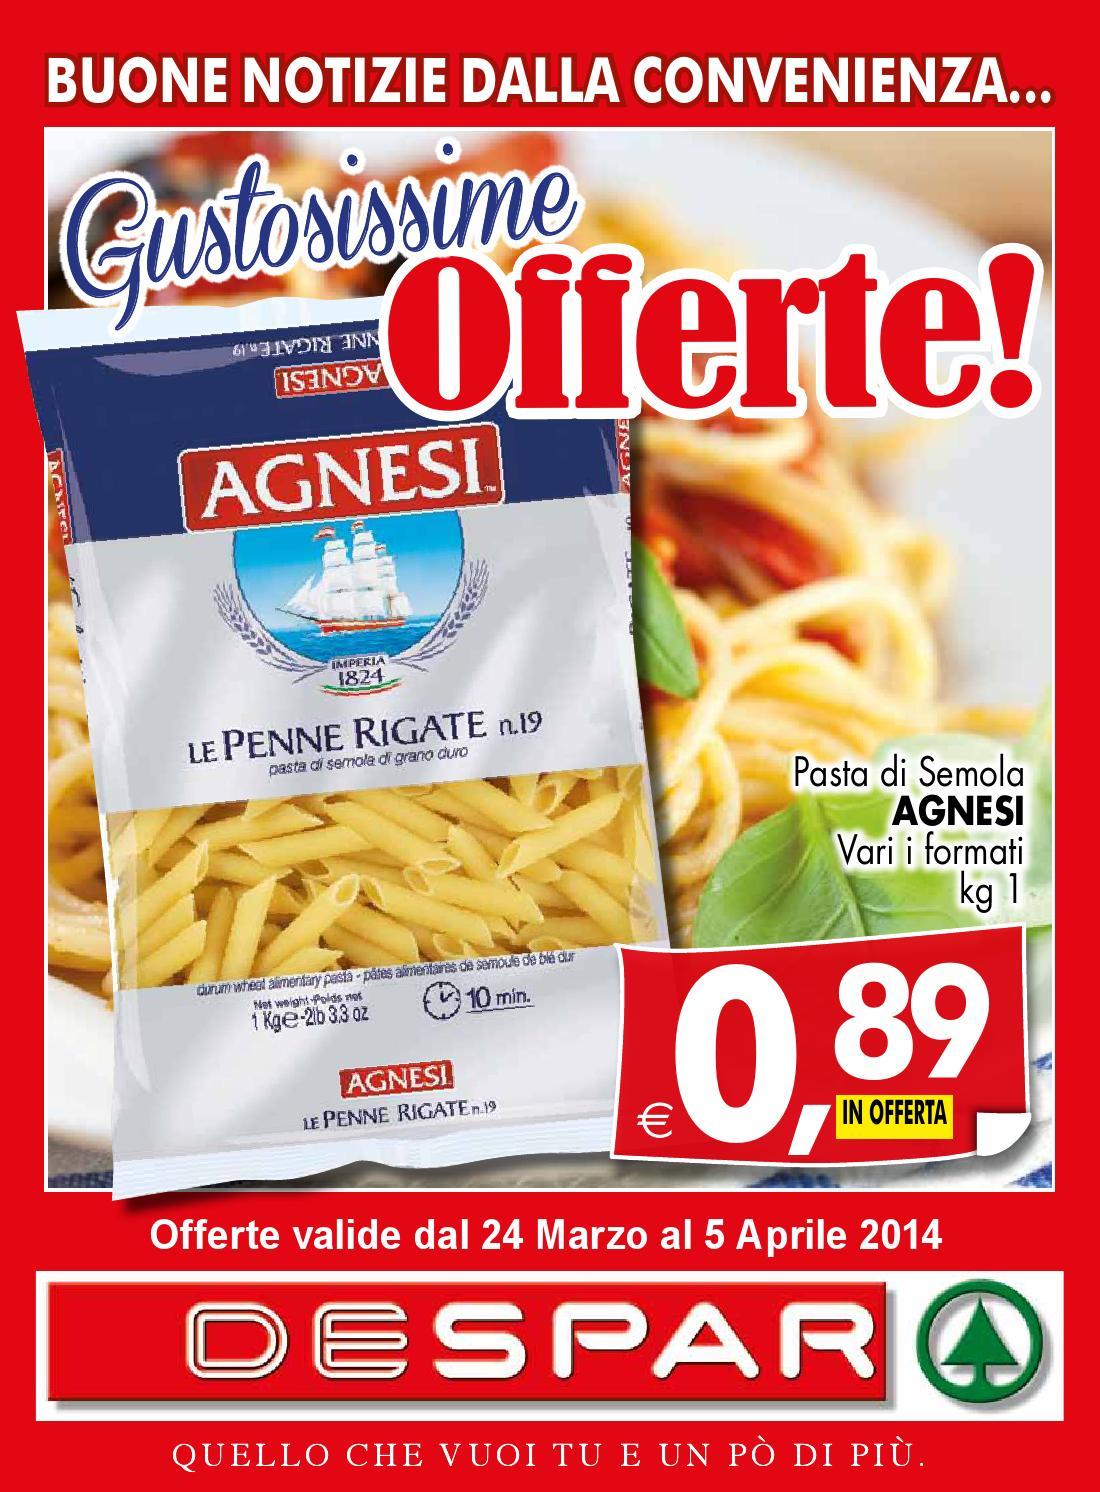 Volantino affiliati 24 marzo 5 aprile 2014 by despar for Volantino offerte despar messina